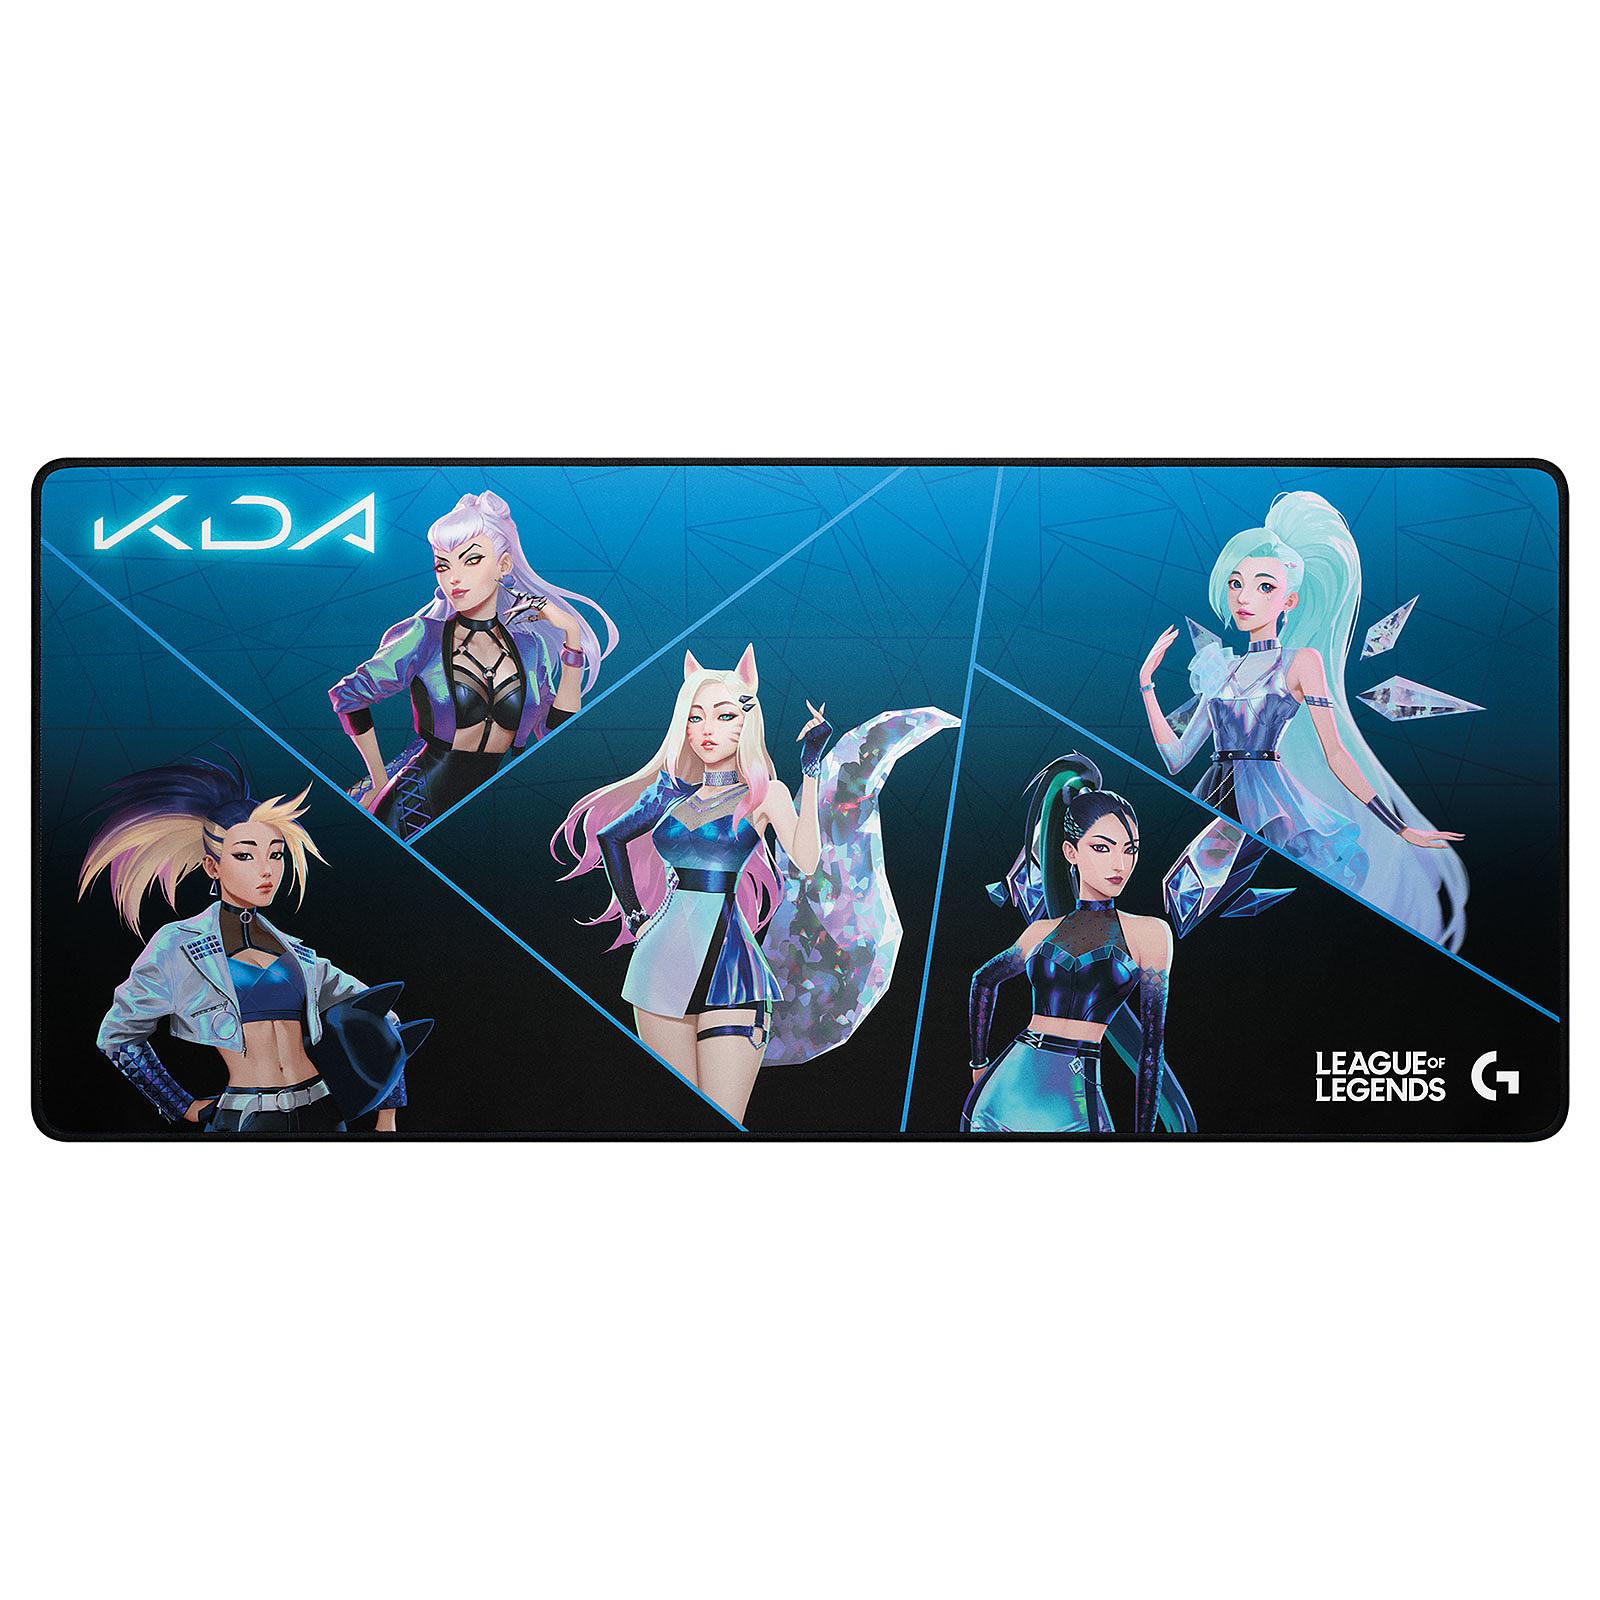 logitech g840 xl gaming mouse pad lol k da